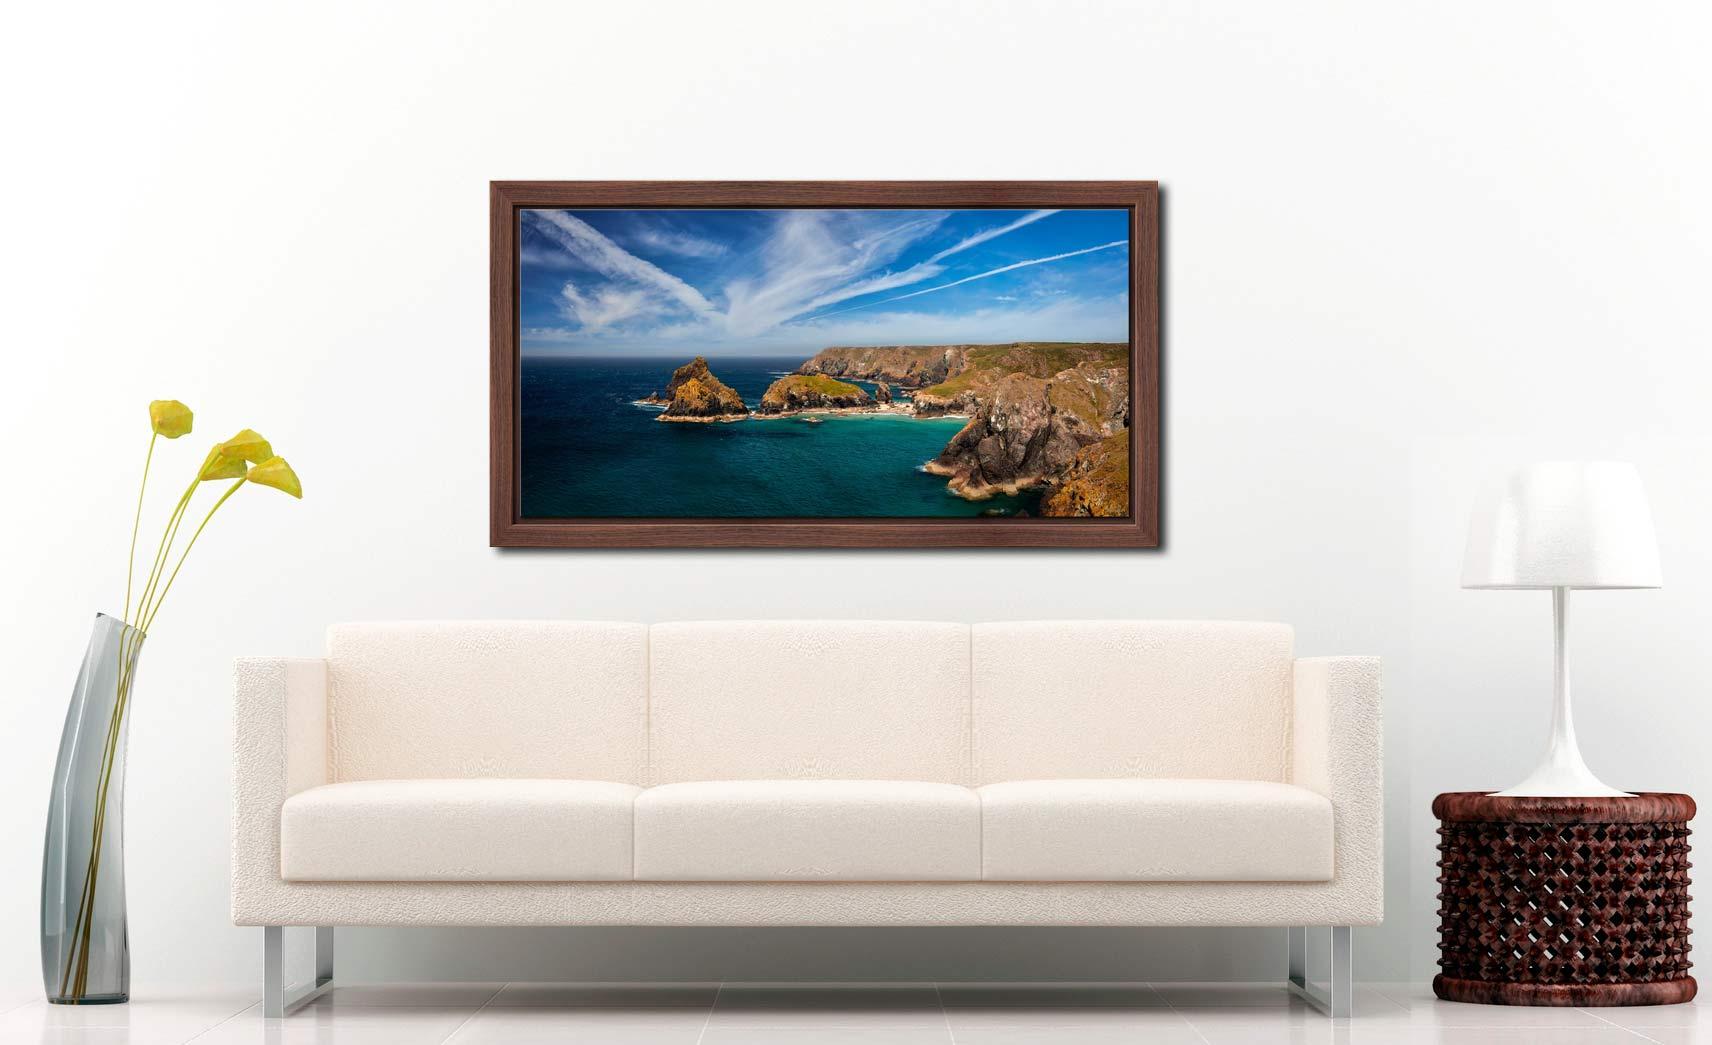 Green Ocean Kynance Cove - Walnut floater frame with acrylic glazing on Wall